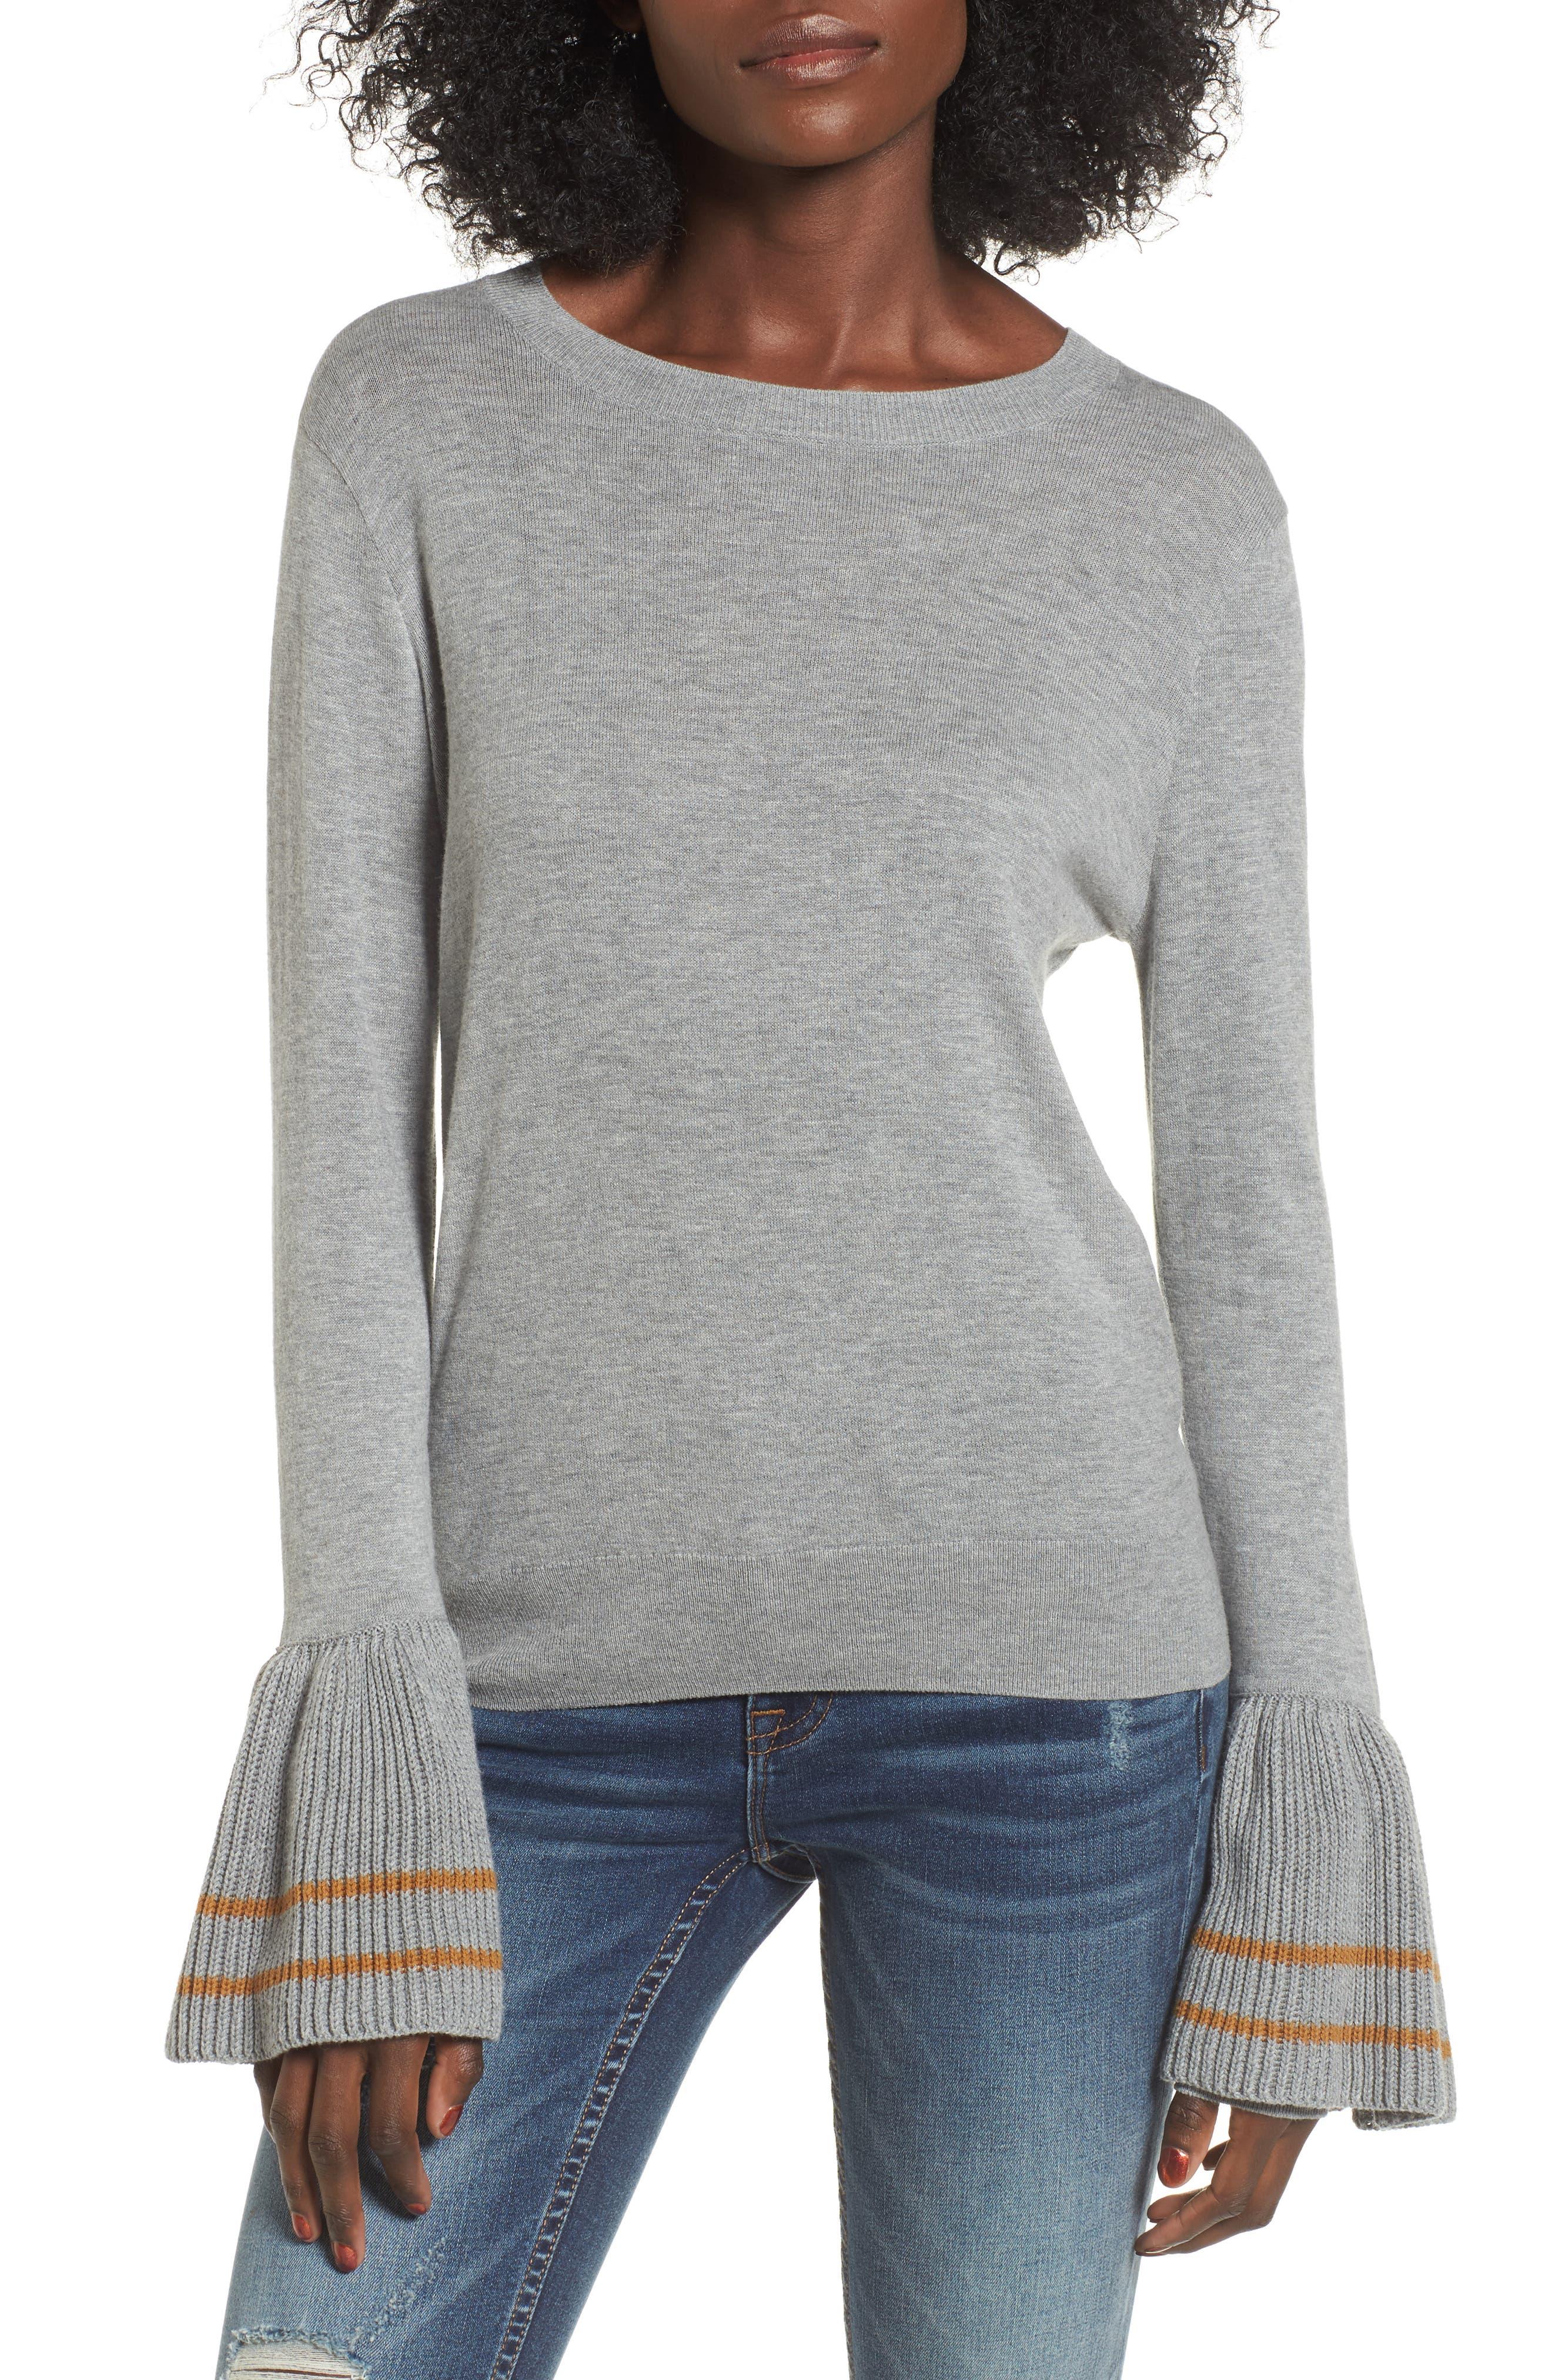 Alternate Image 1 Selected - BP. Ruffle Bell Cuff Sweater